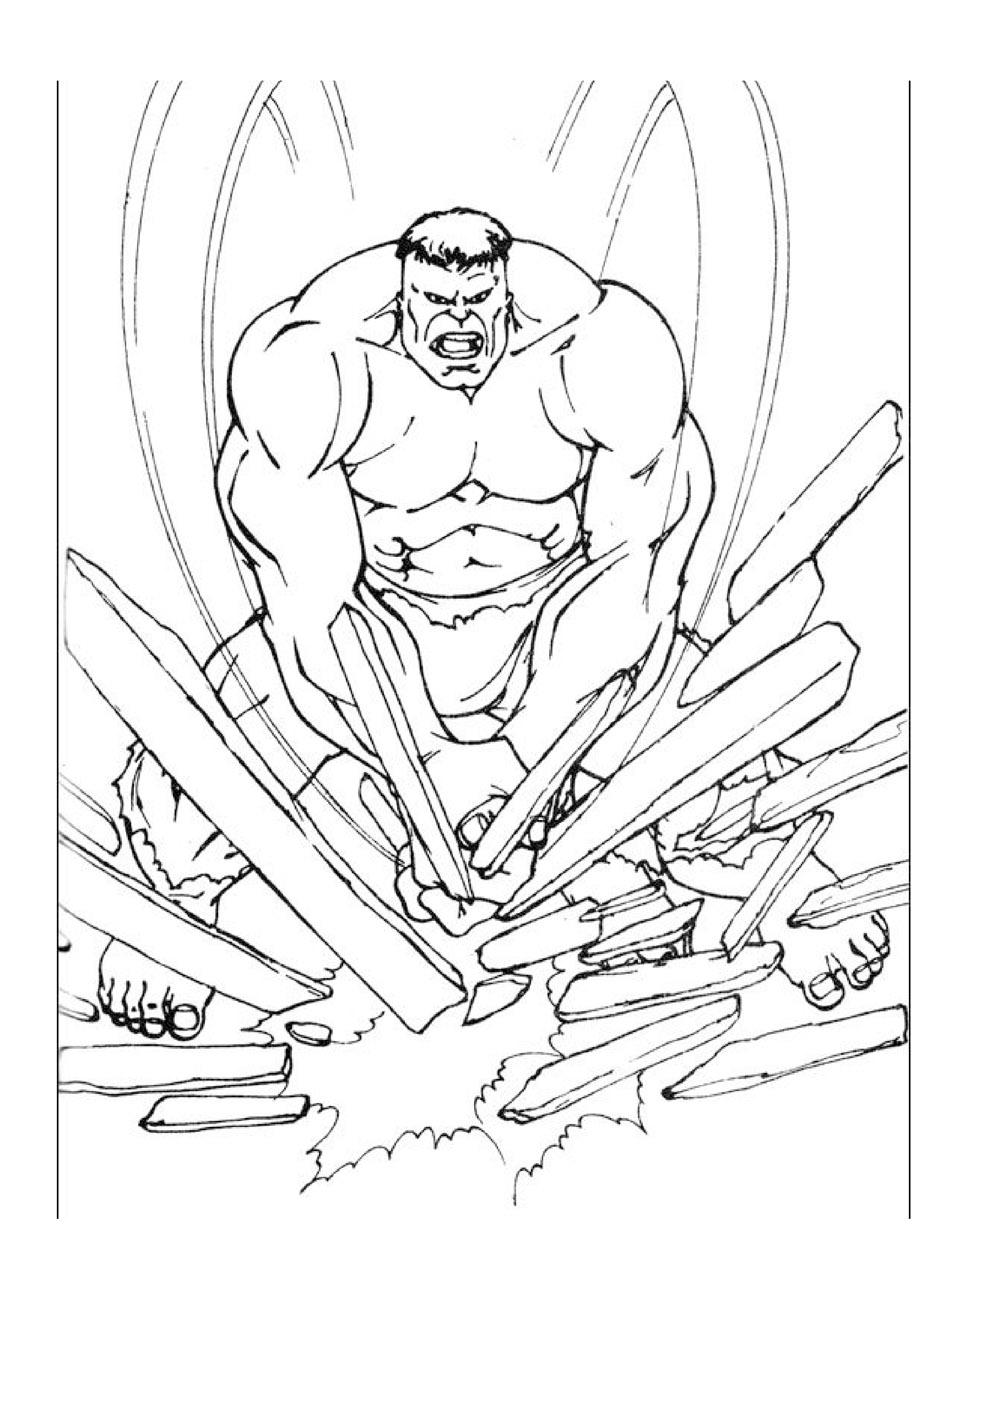 Printable Hulk coloring page to print and color